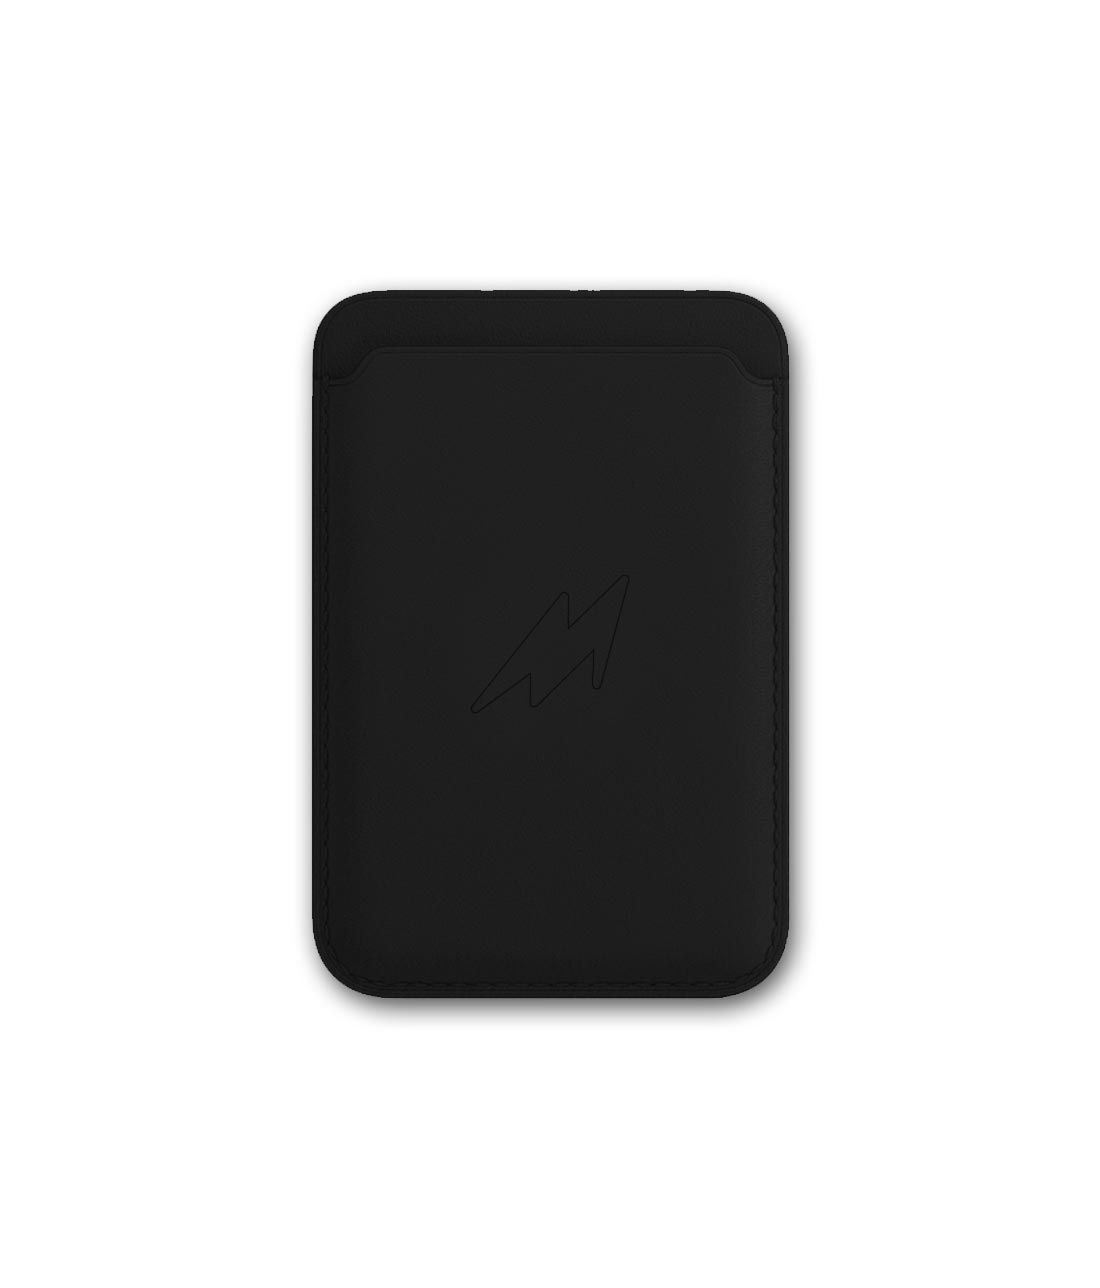 Leather Case Black - Magsafe Card Case